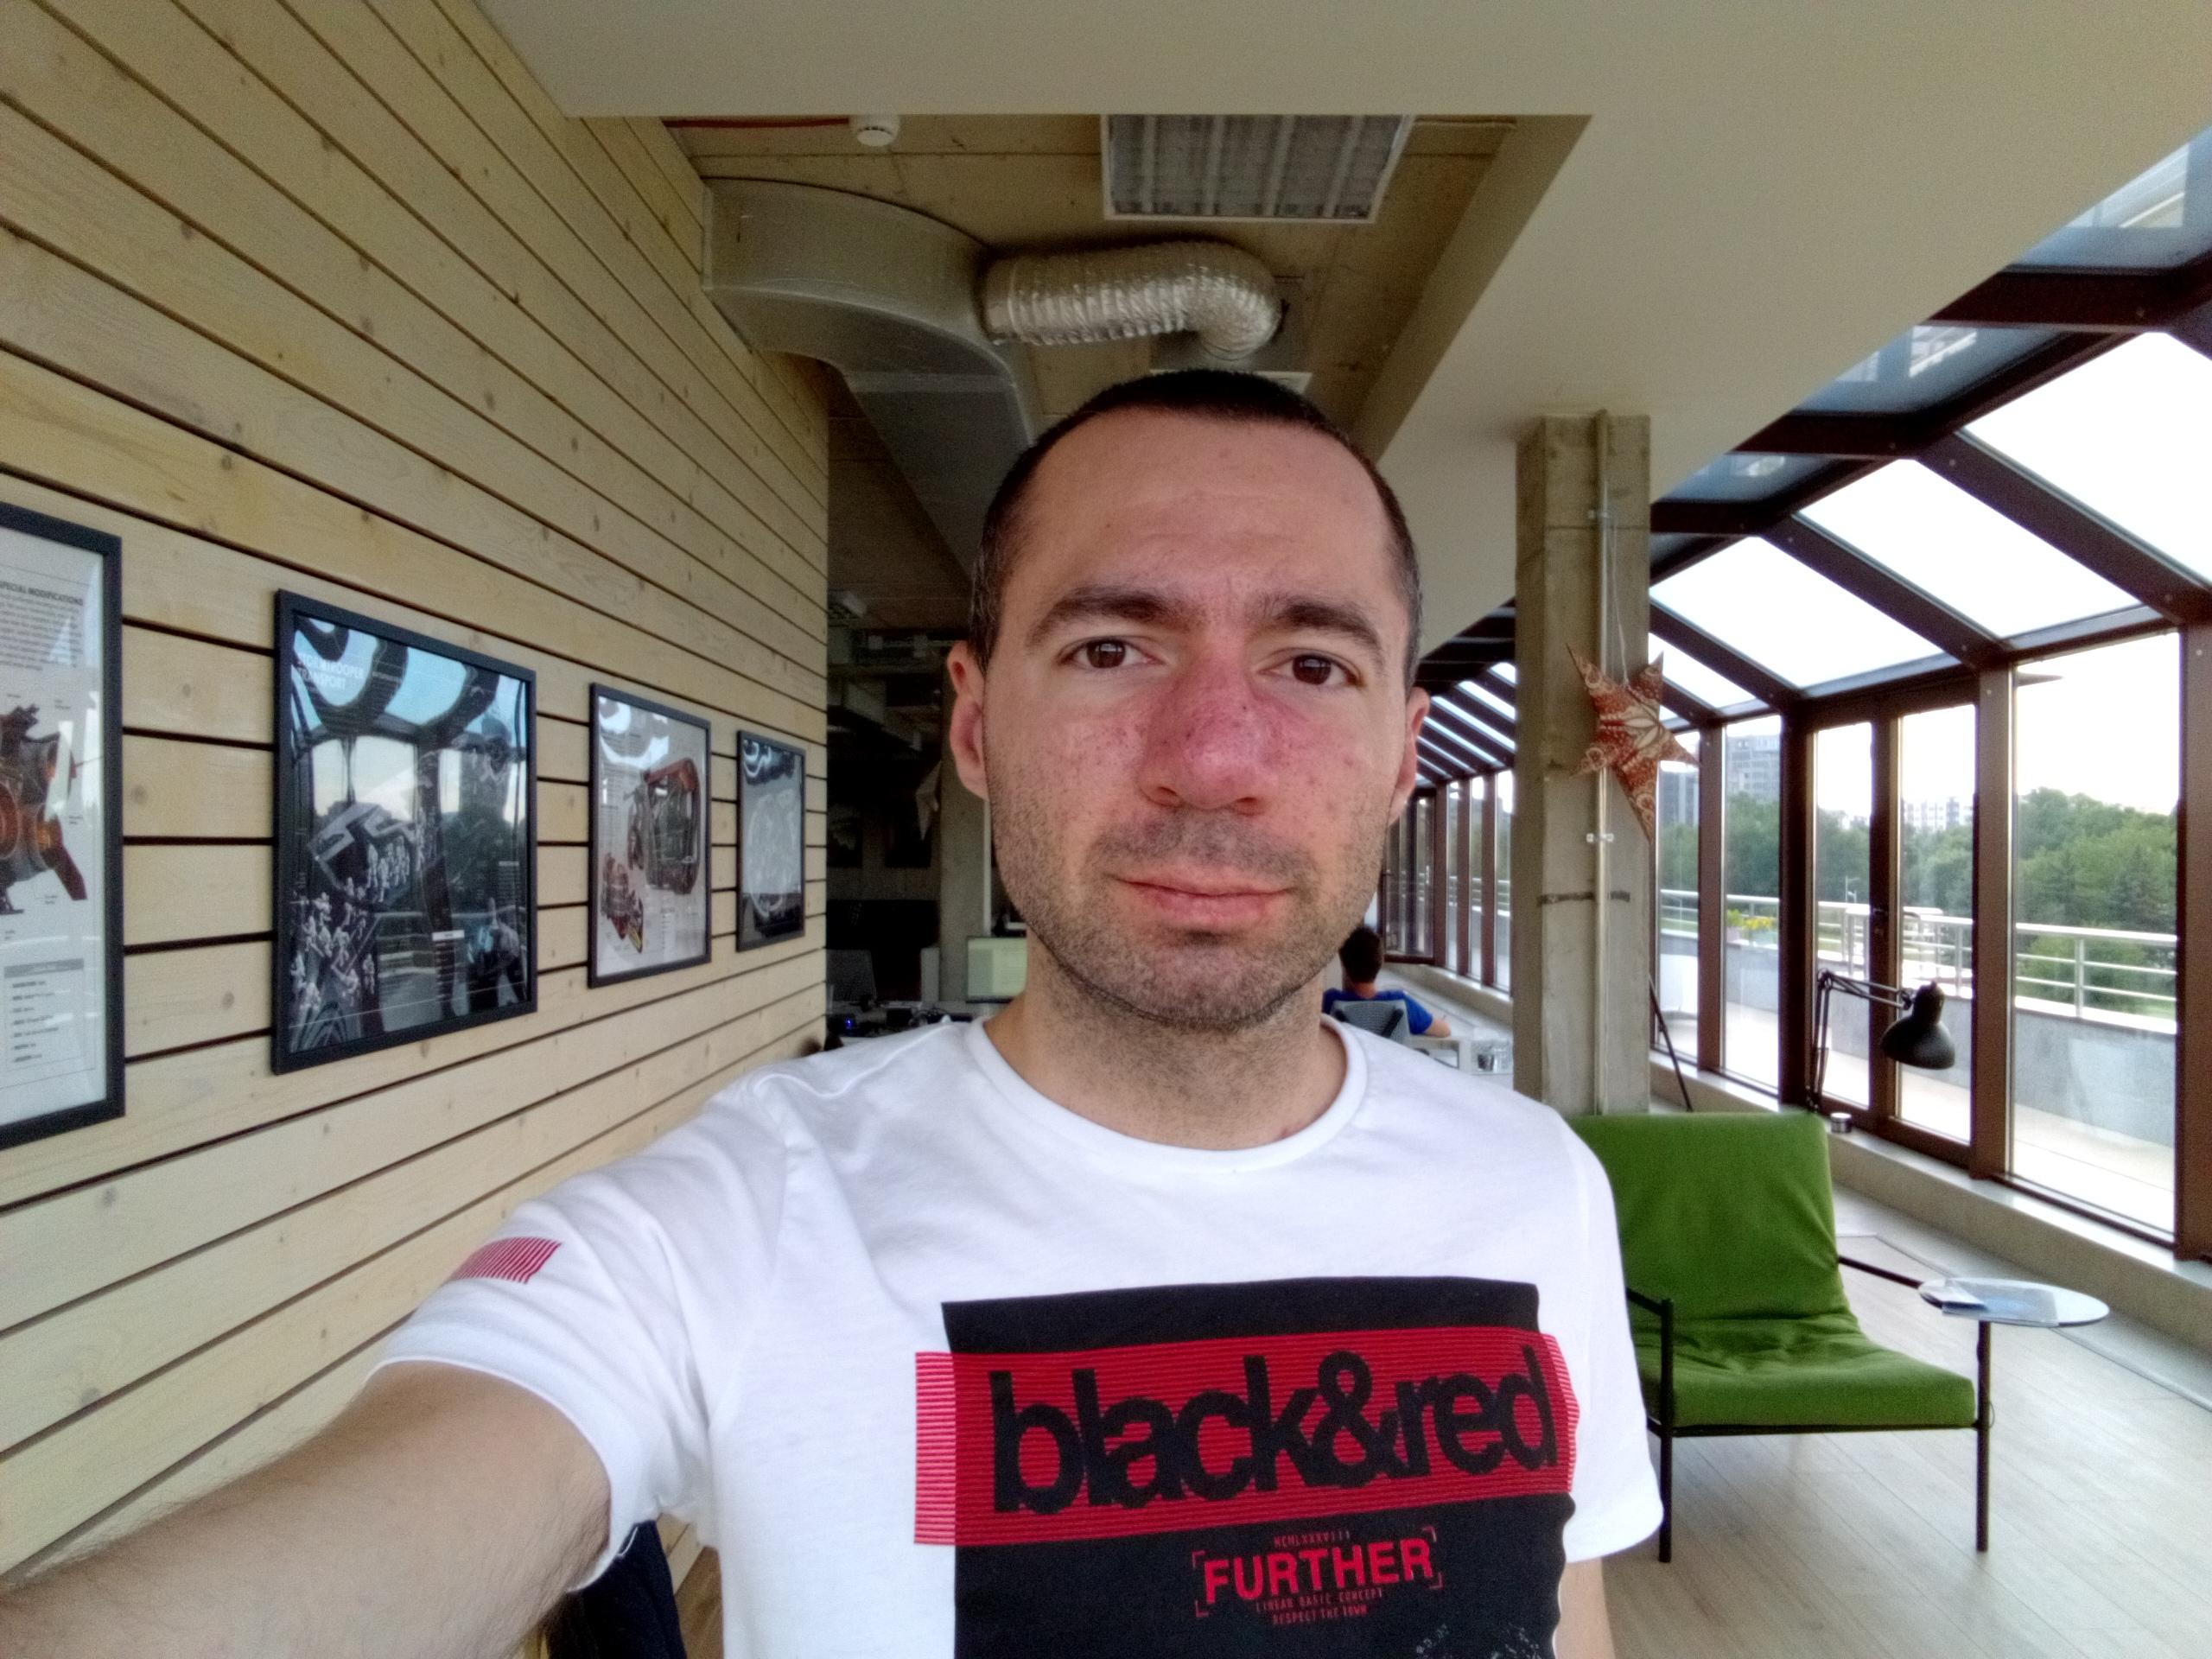 f/2.2, ISO 100, 1/106s - Sony Xperia L1 Selfie Sample